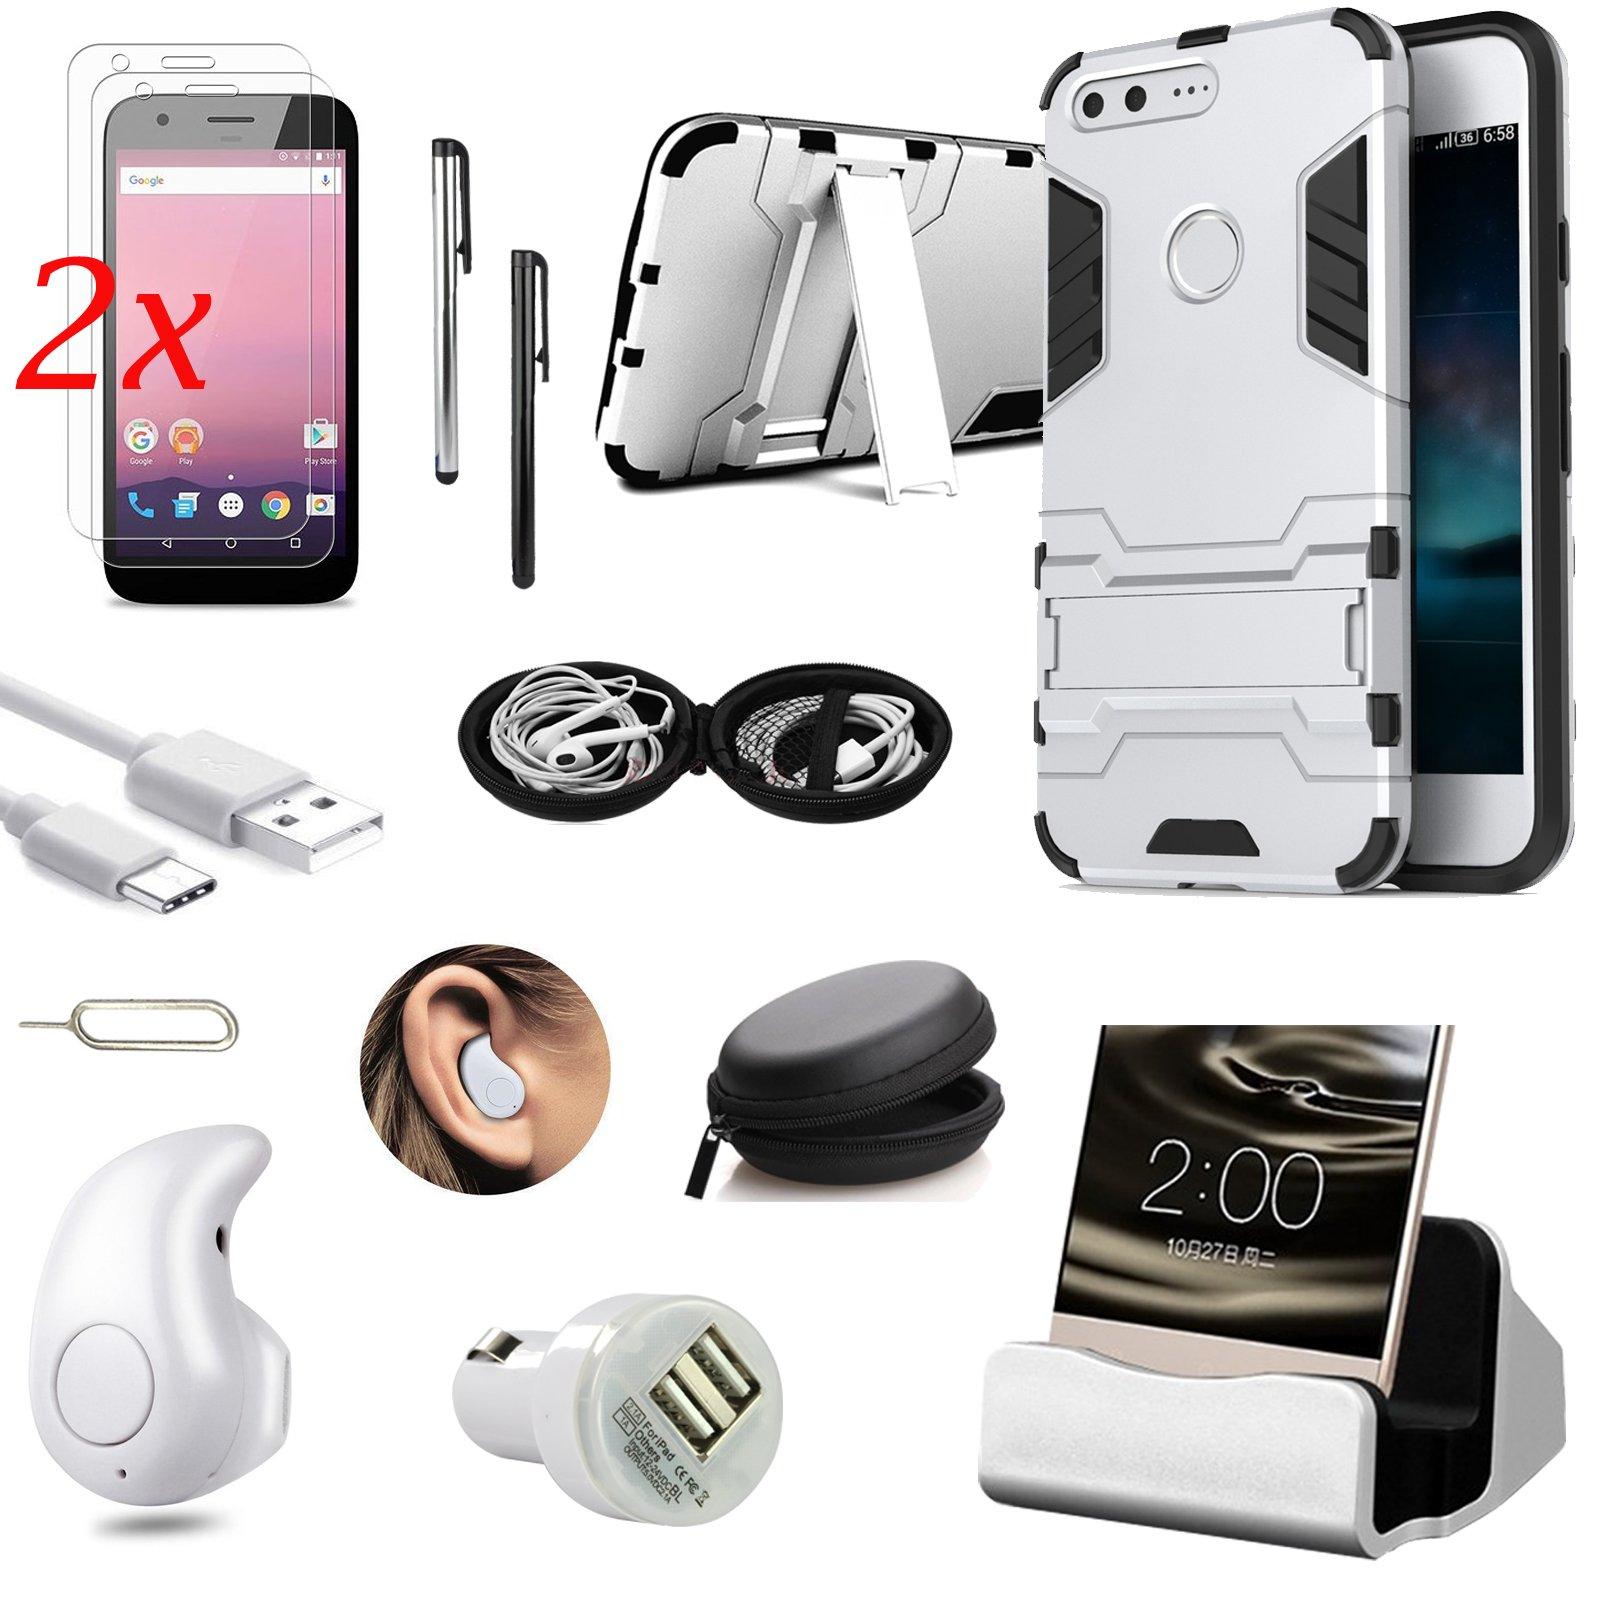 kickstand case charger wireless headset earphones. Black Bedroom Furniture Sets. Home Design Ideas